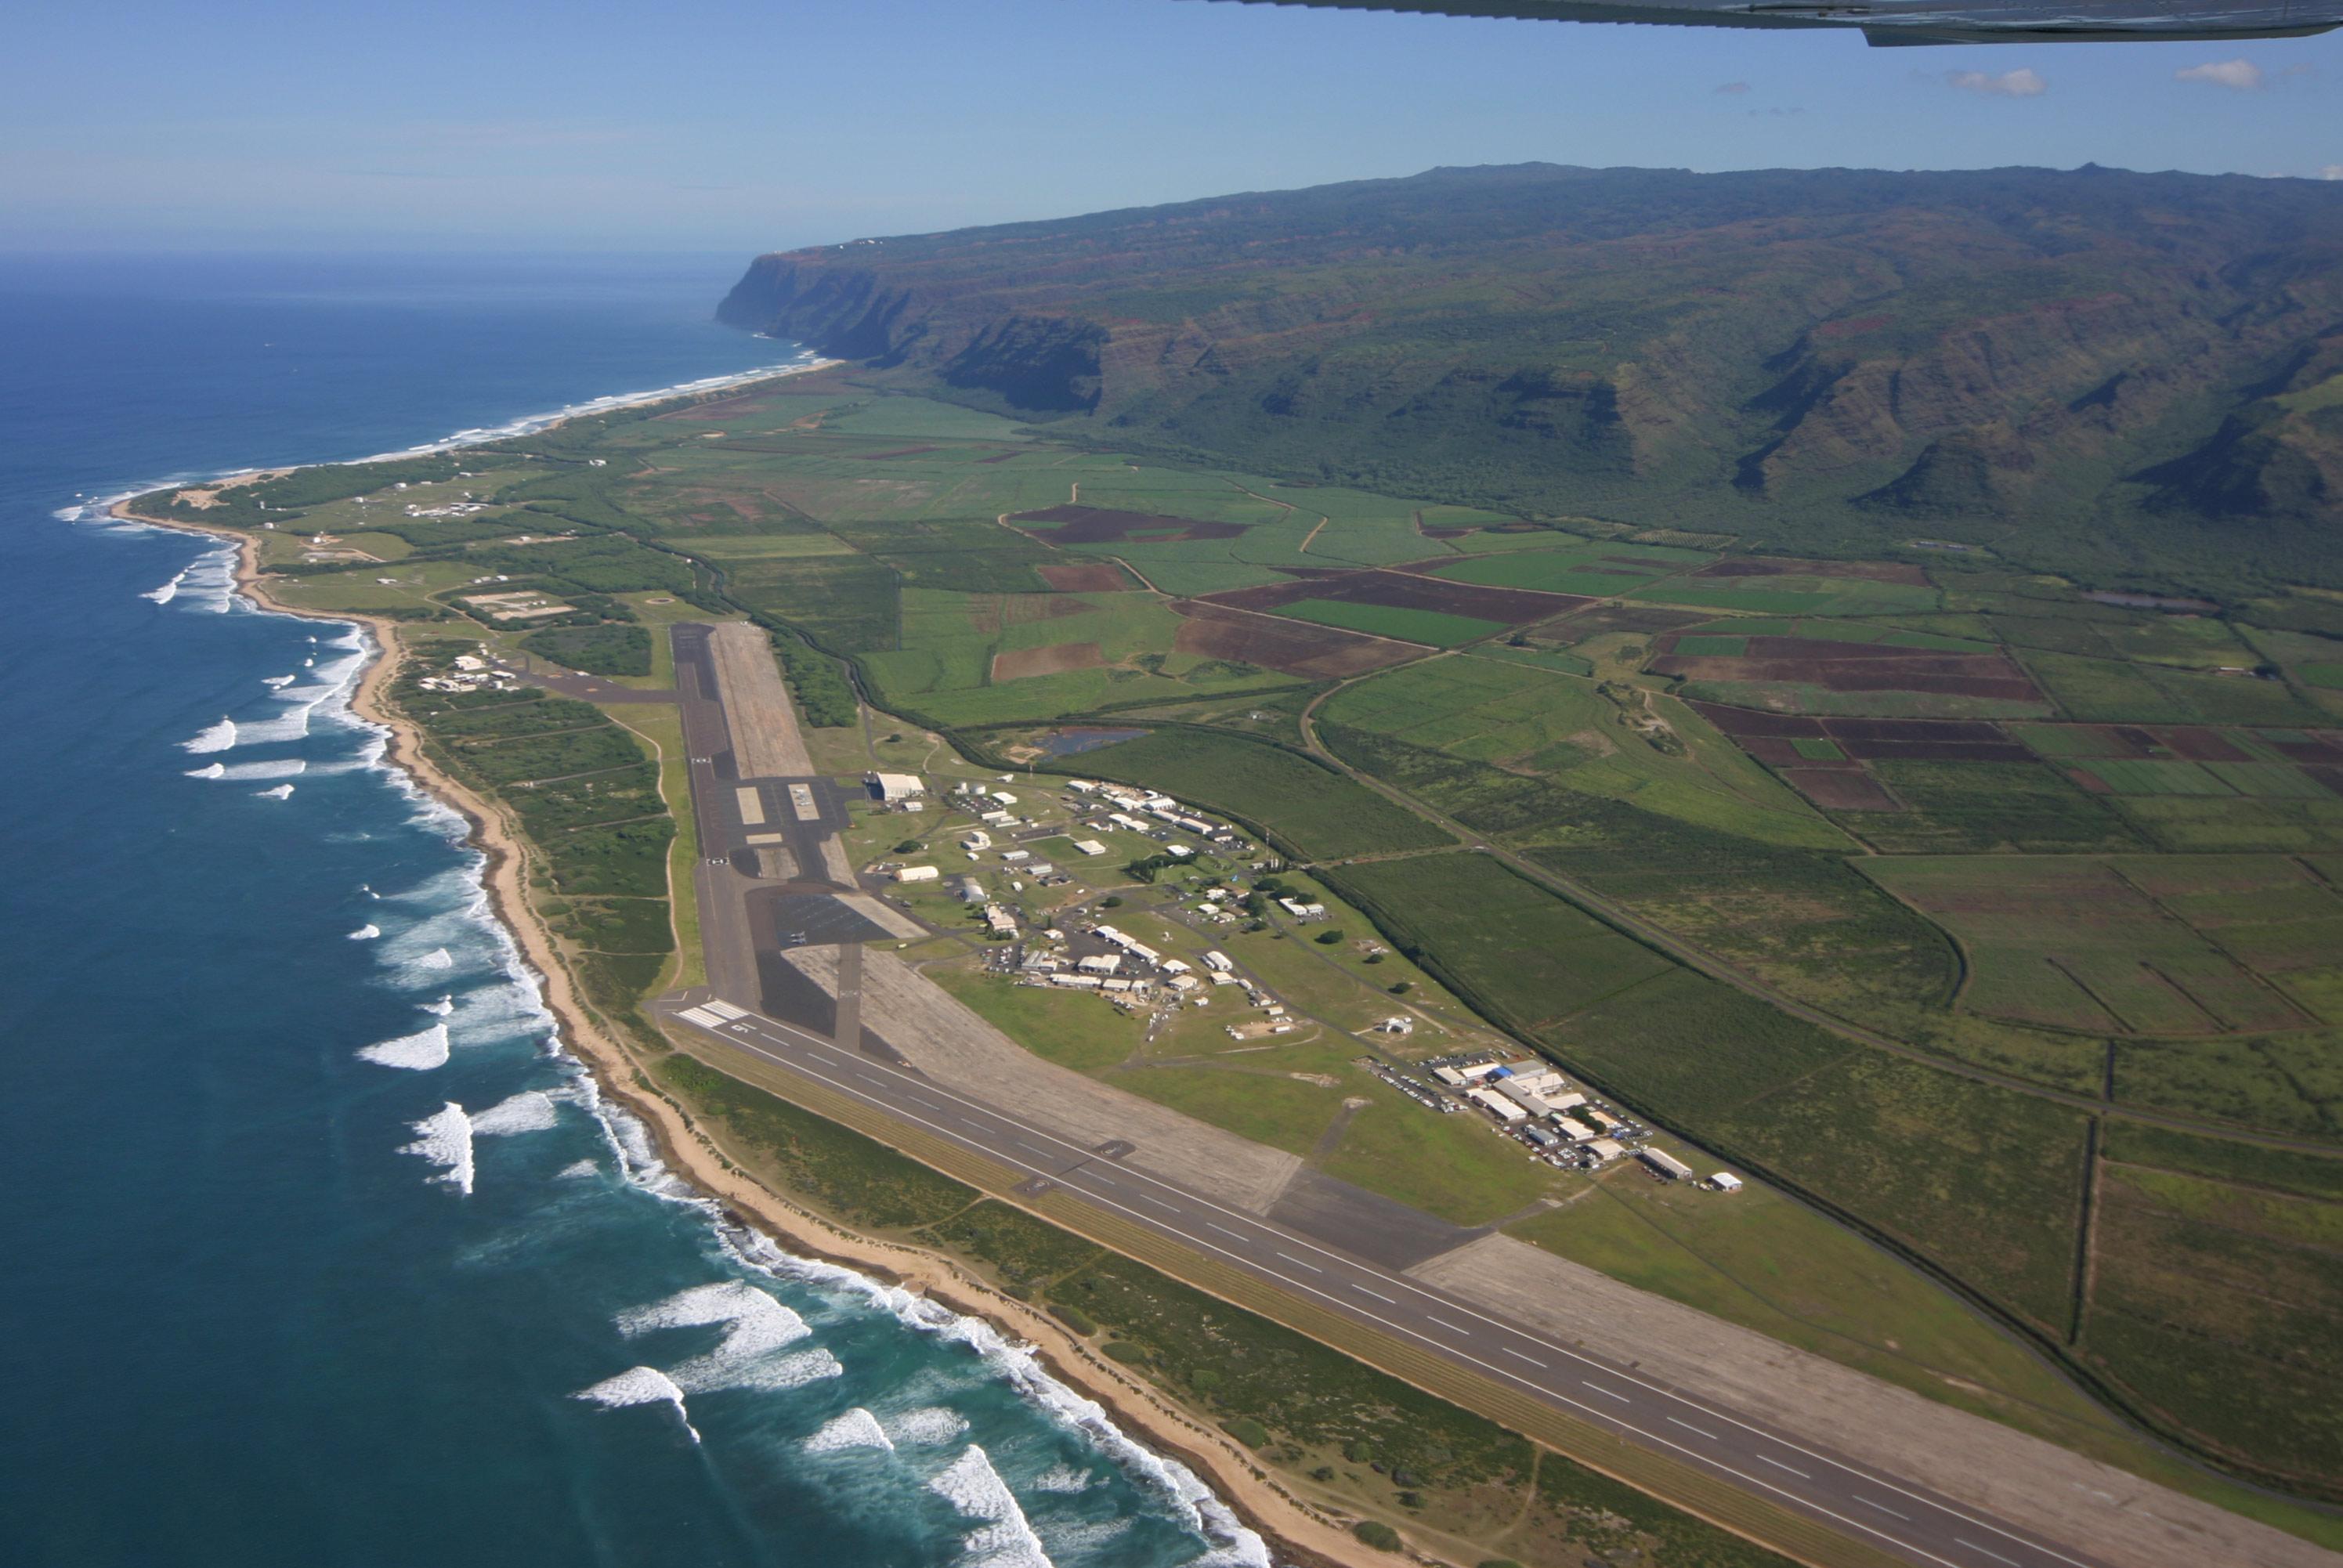 Pacific Missile Range Facility - Wikipedia